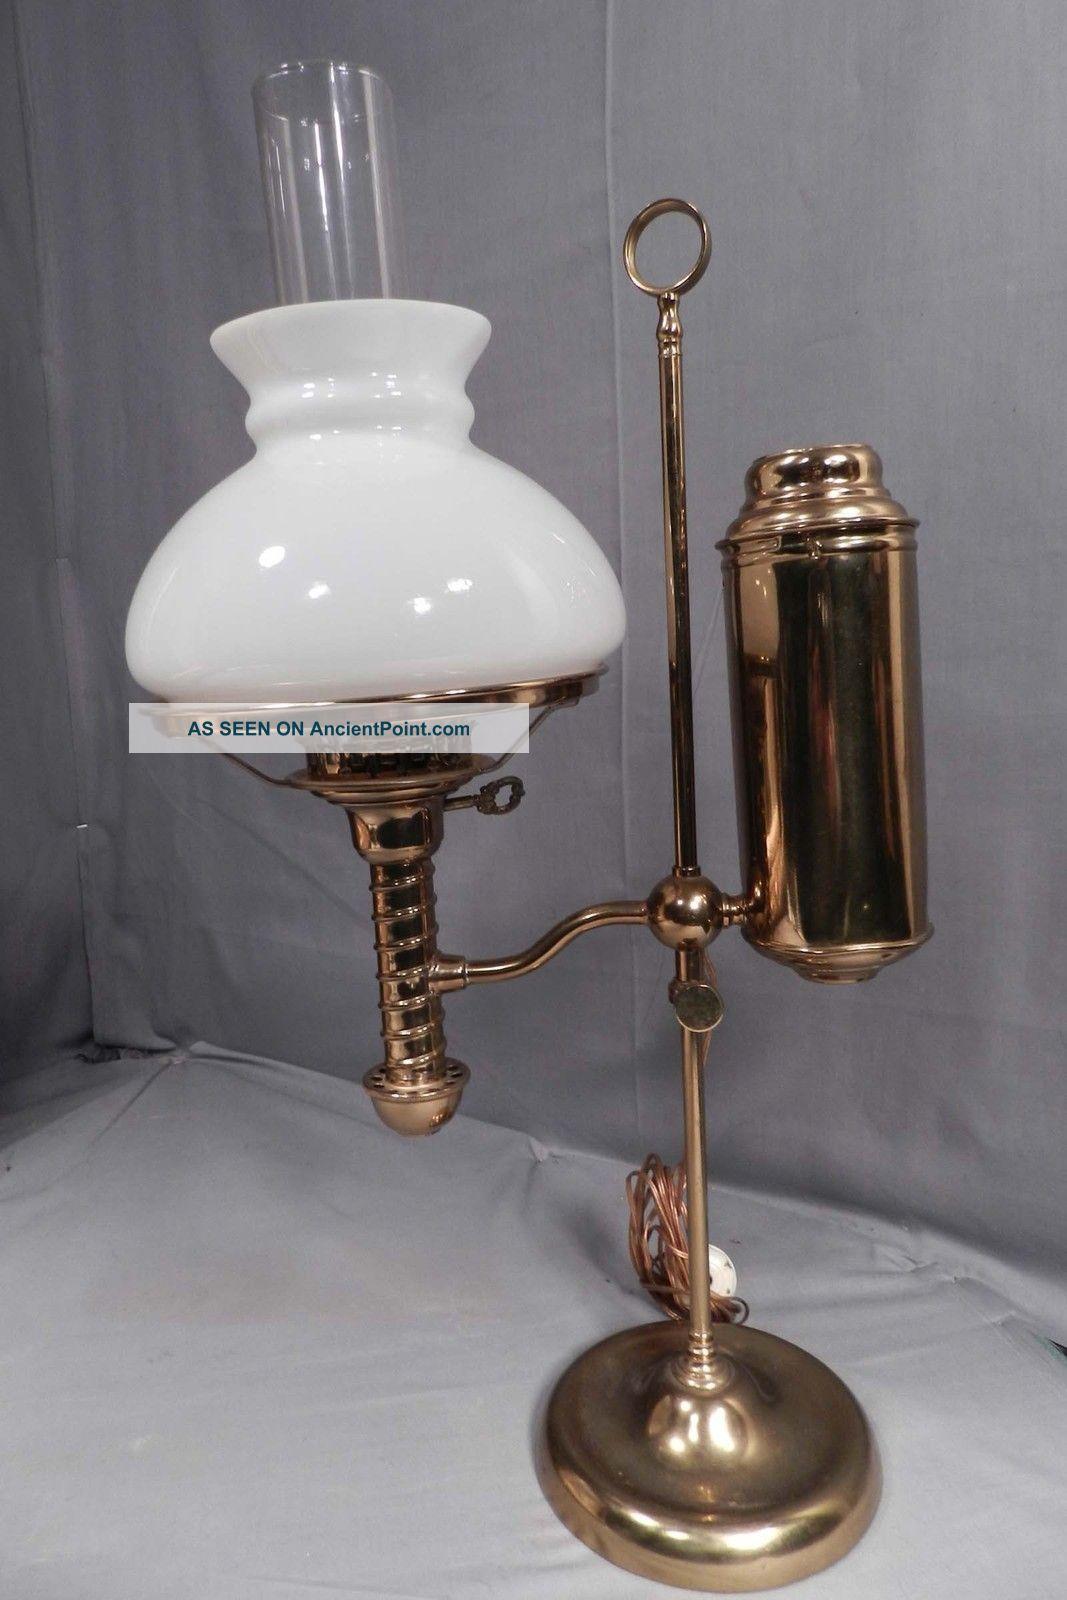 Antique Brass American Student Lamp Argand Oil Wired Kerosene Victorian Desk - Antique Brass American Student Lamp Argand Oil Wired Kerosene